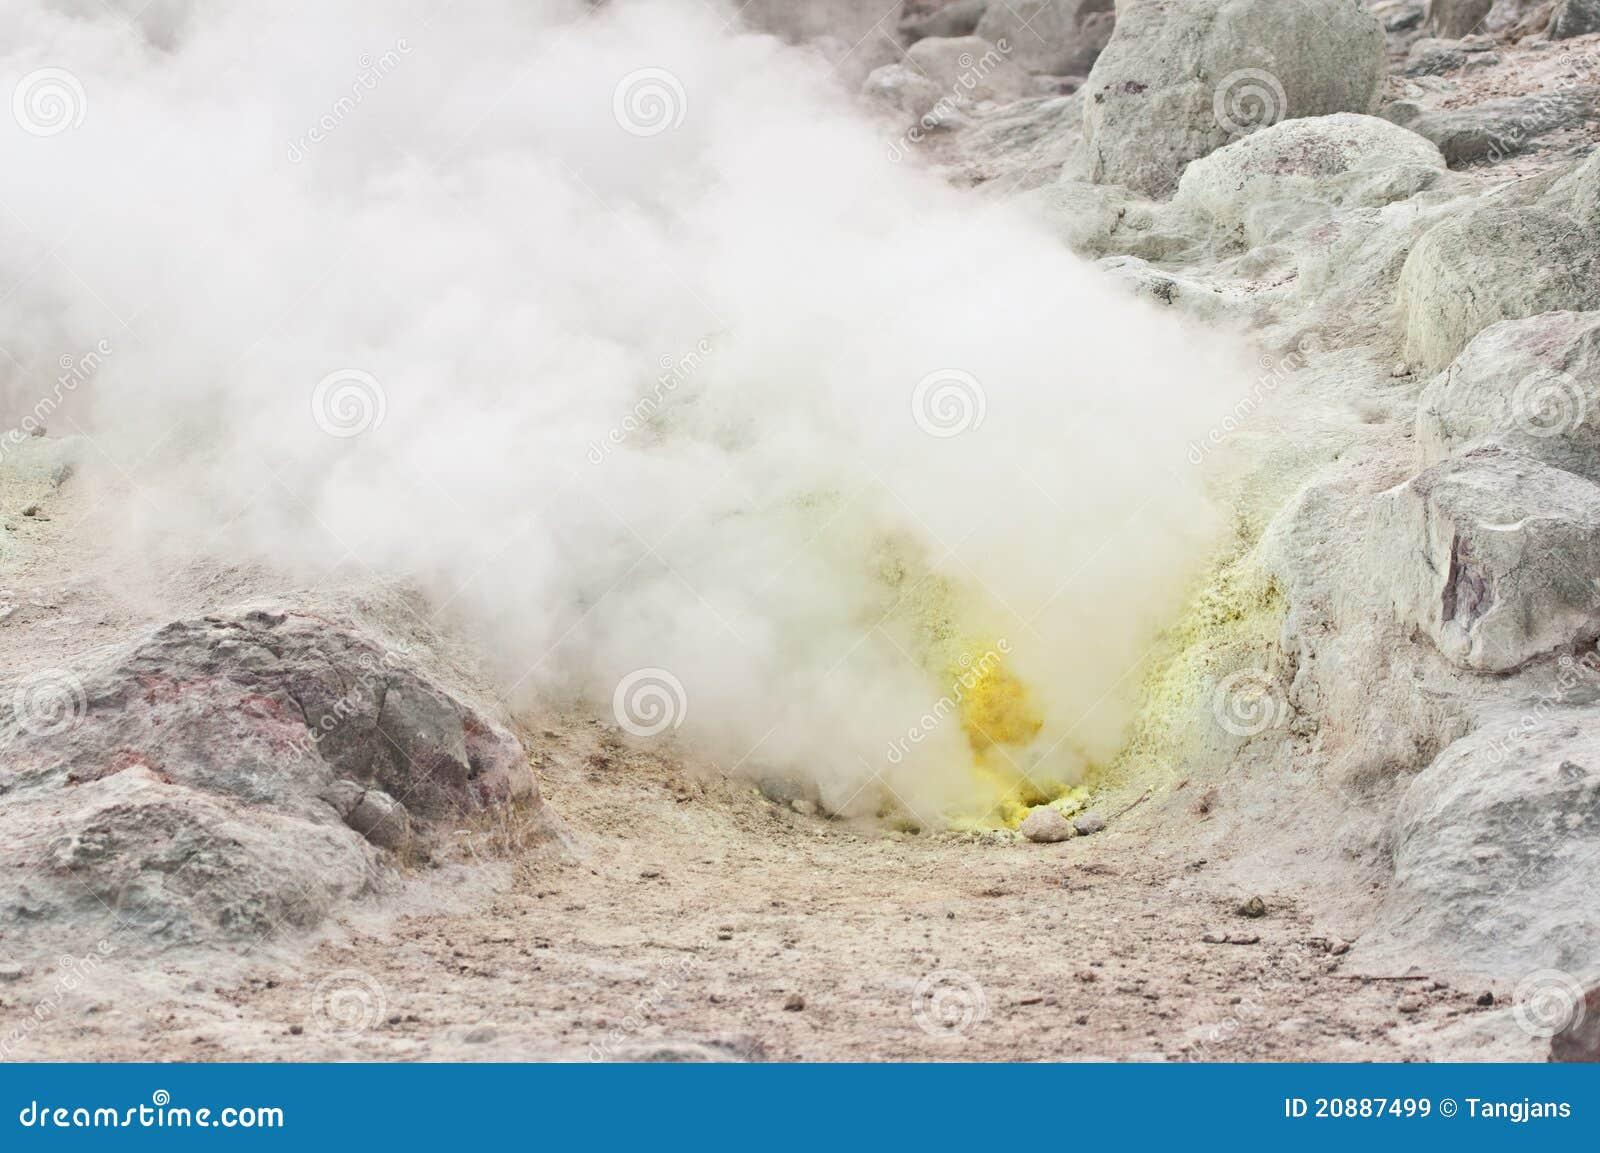 Sulphur Fumes Emitting From Vent, Hokkaido Stock Image